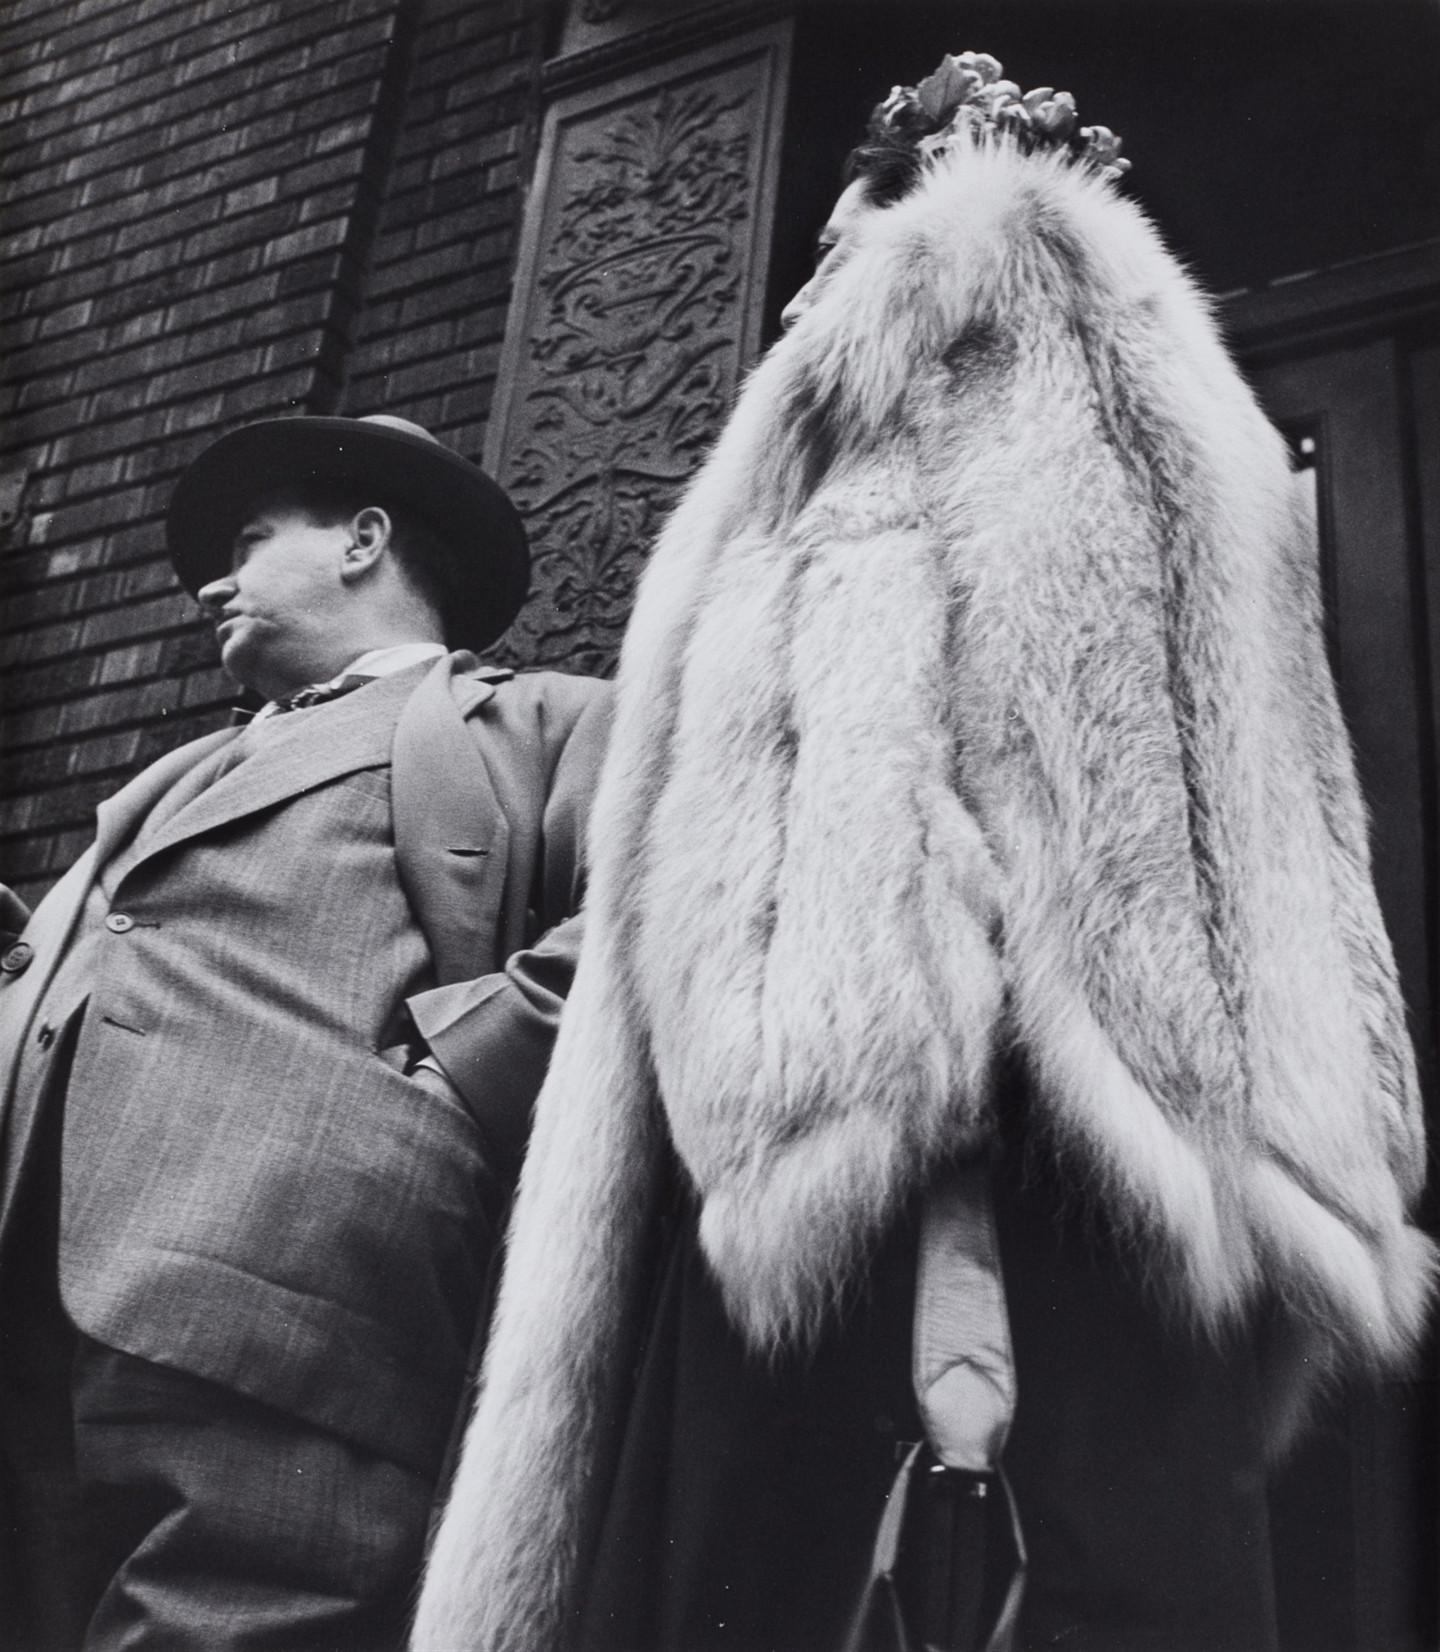 Leon Levinstein. New York City, 1954